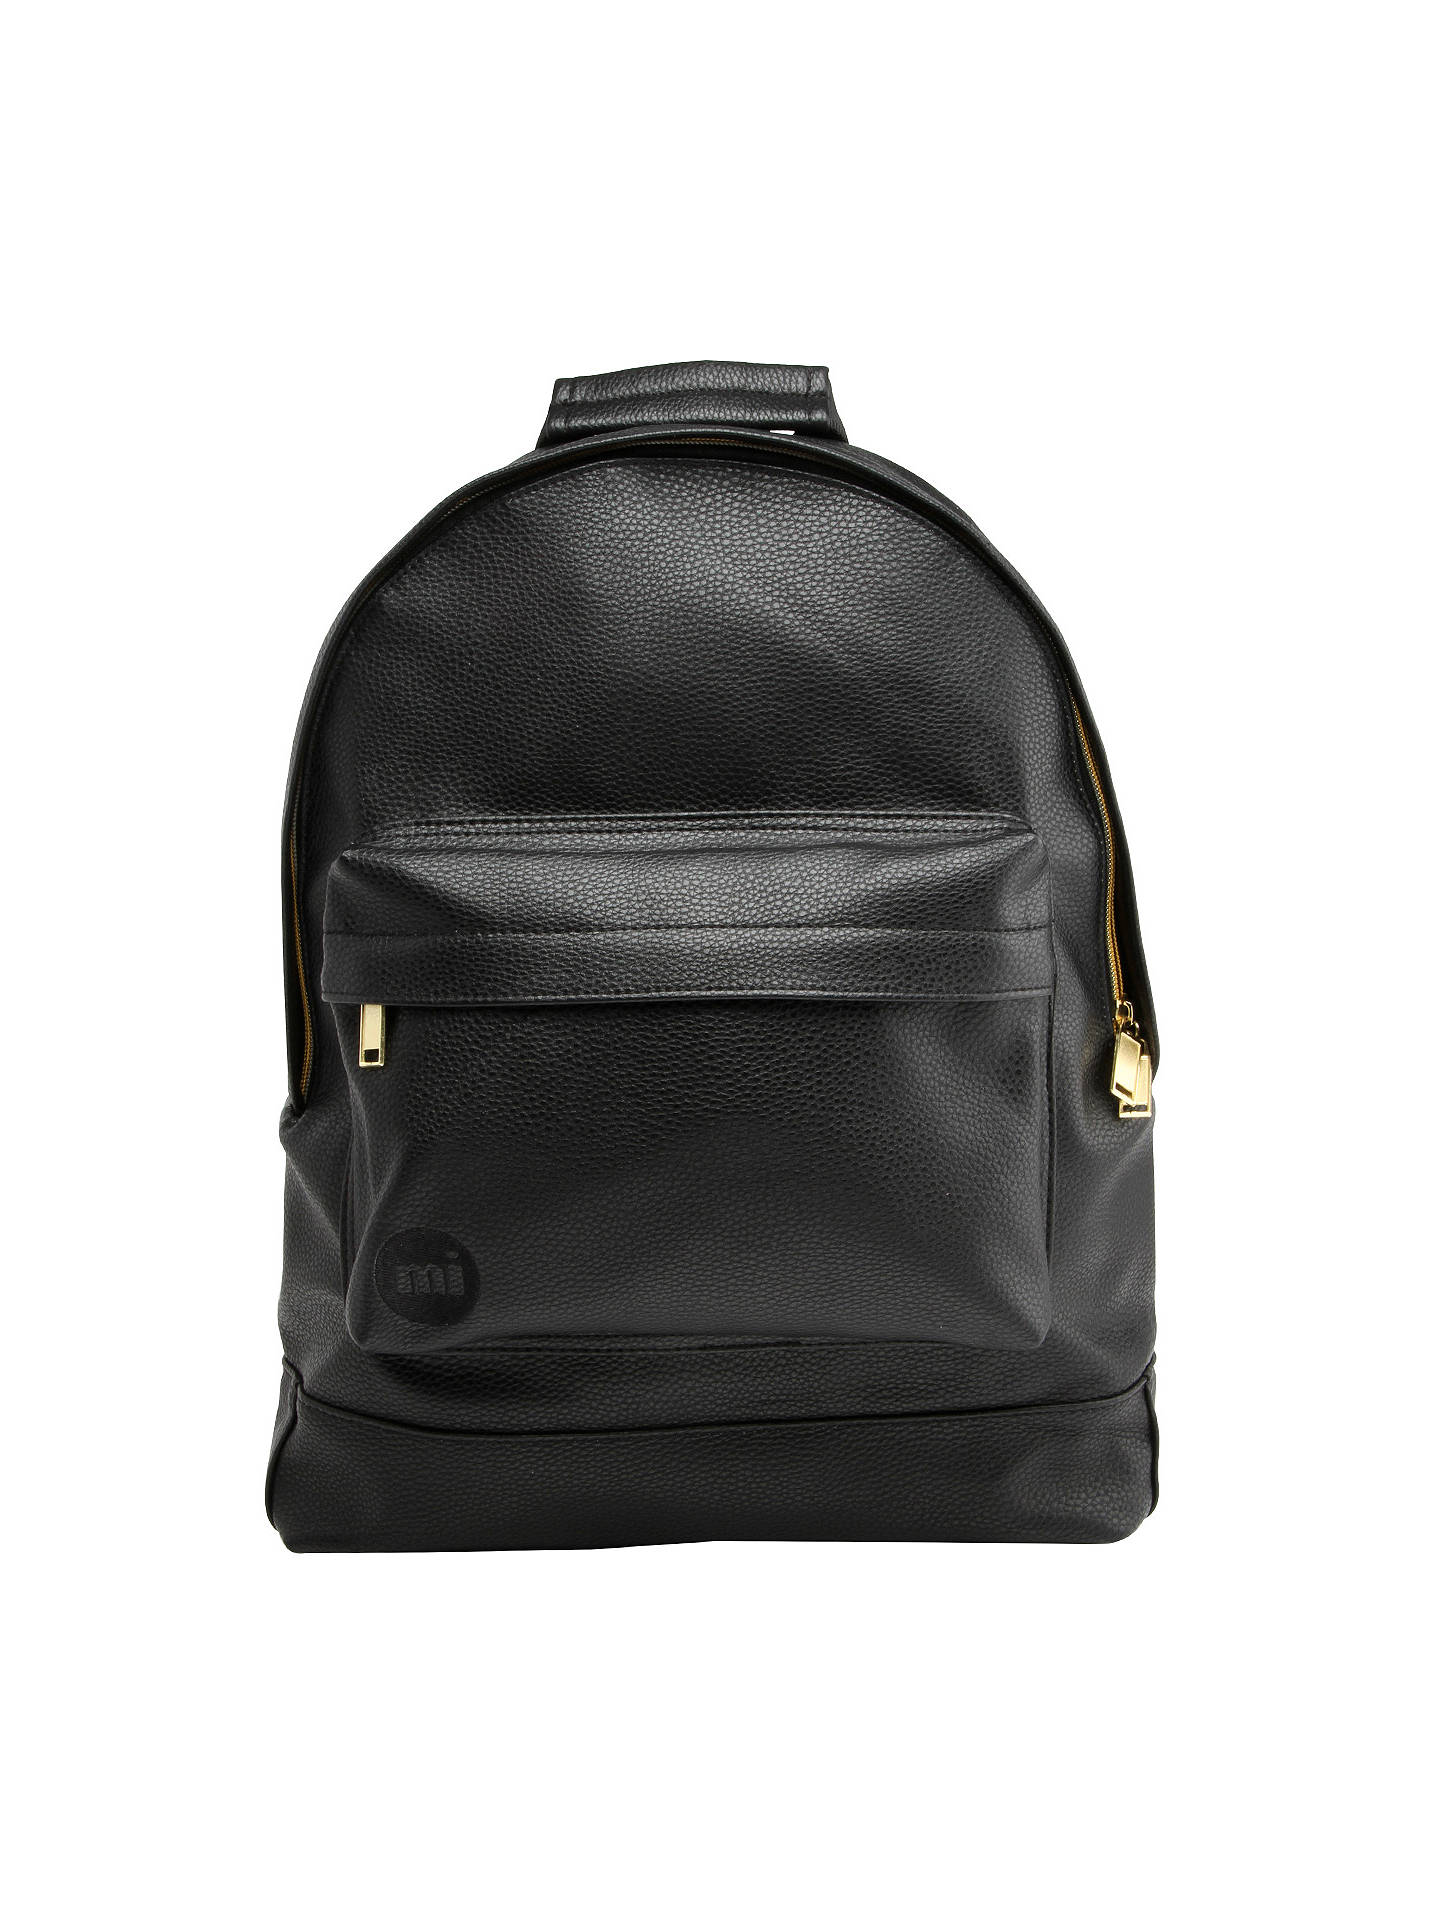 3613dca4692d BuyMi-Pac Gold Tumbled Backpack, Black Online at johnlewis.com ...